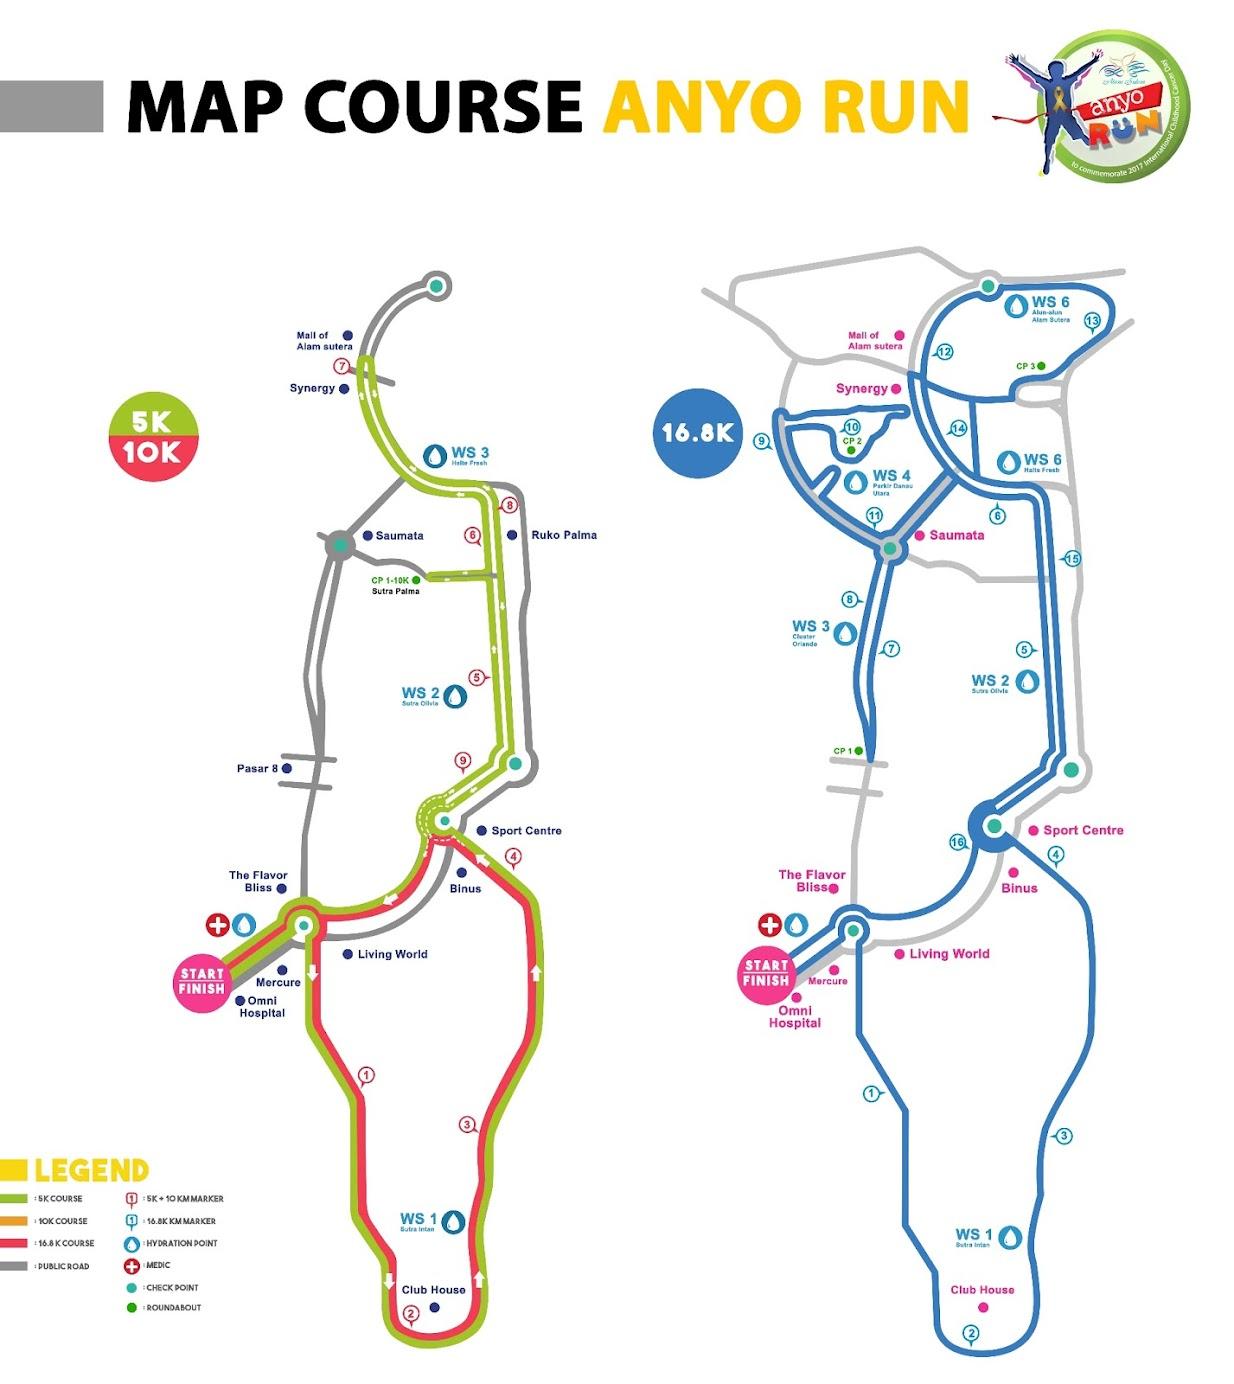 Anyo Charity Run Route 2018